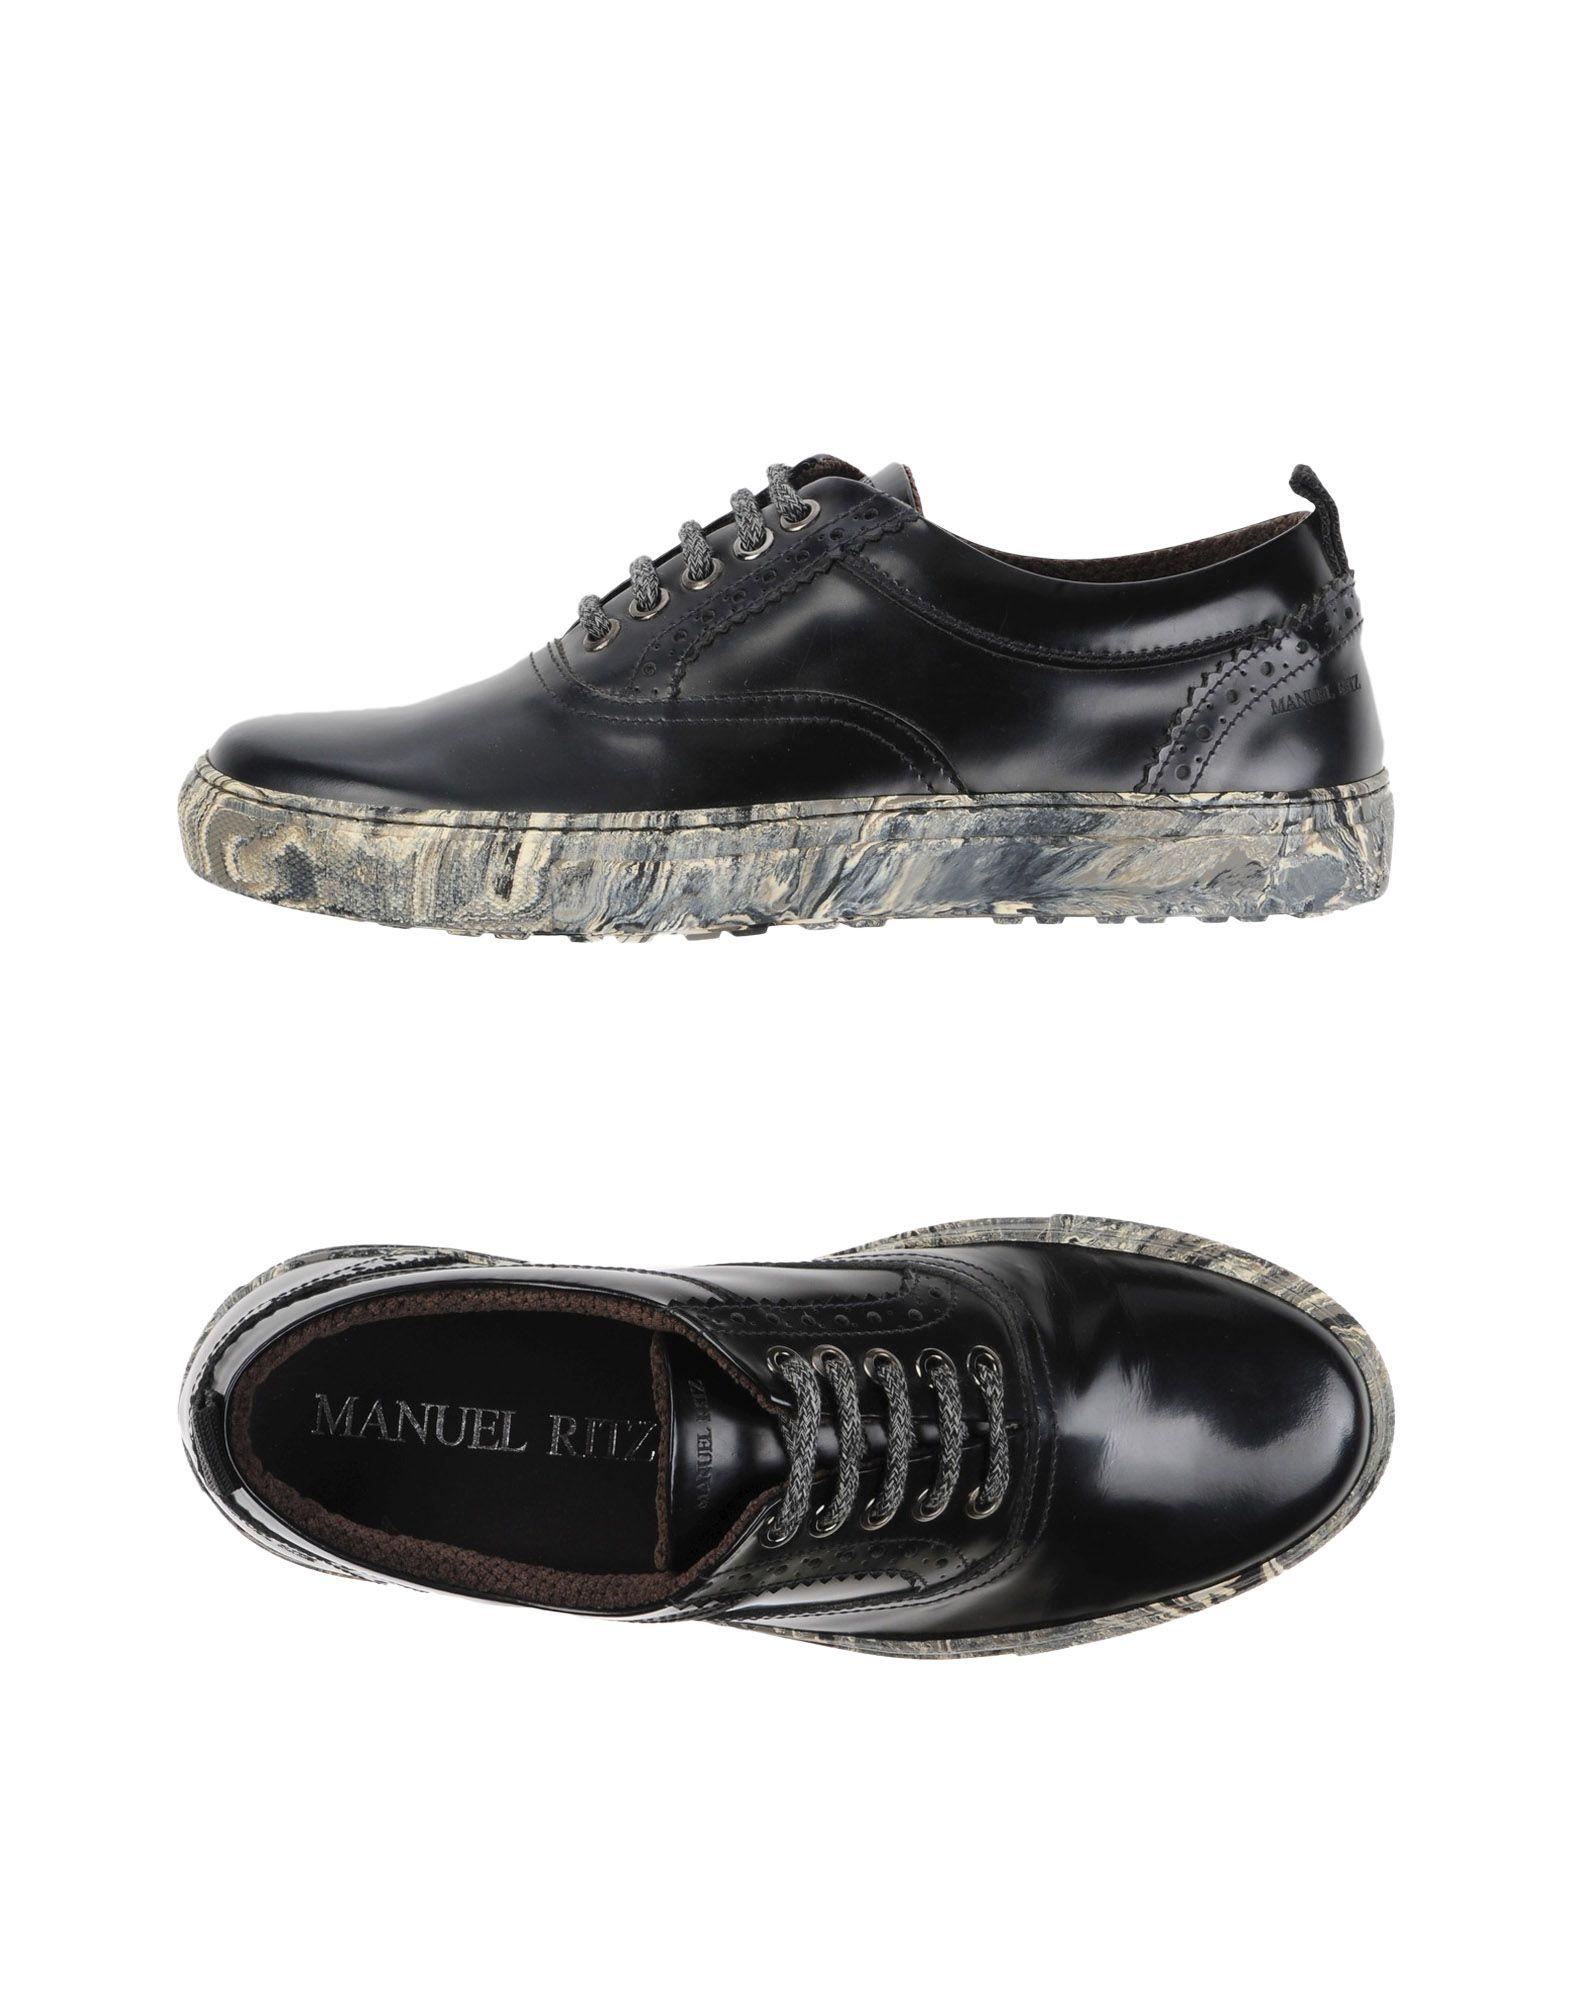 Rabatt echte Schuhe Manuel Ritz Schnürschuhe Herren  11306569QD